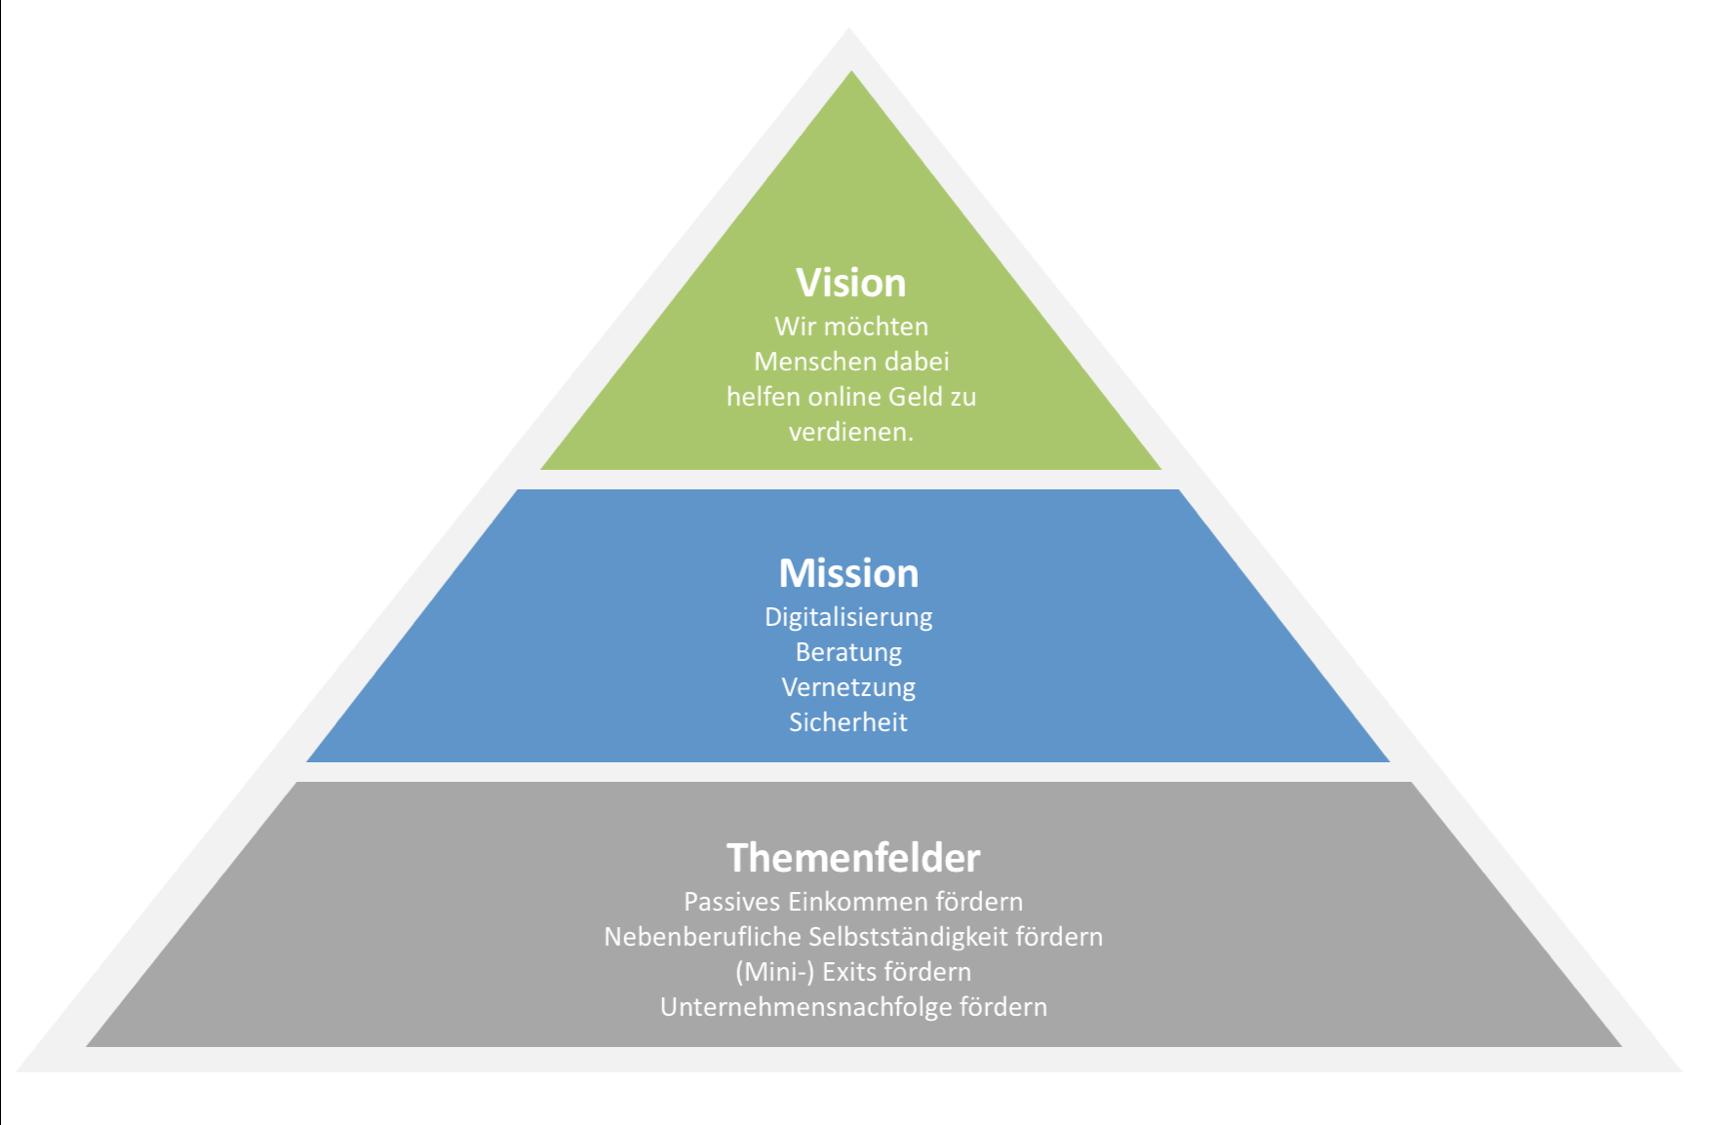 projektify vision mission themen